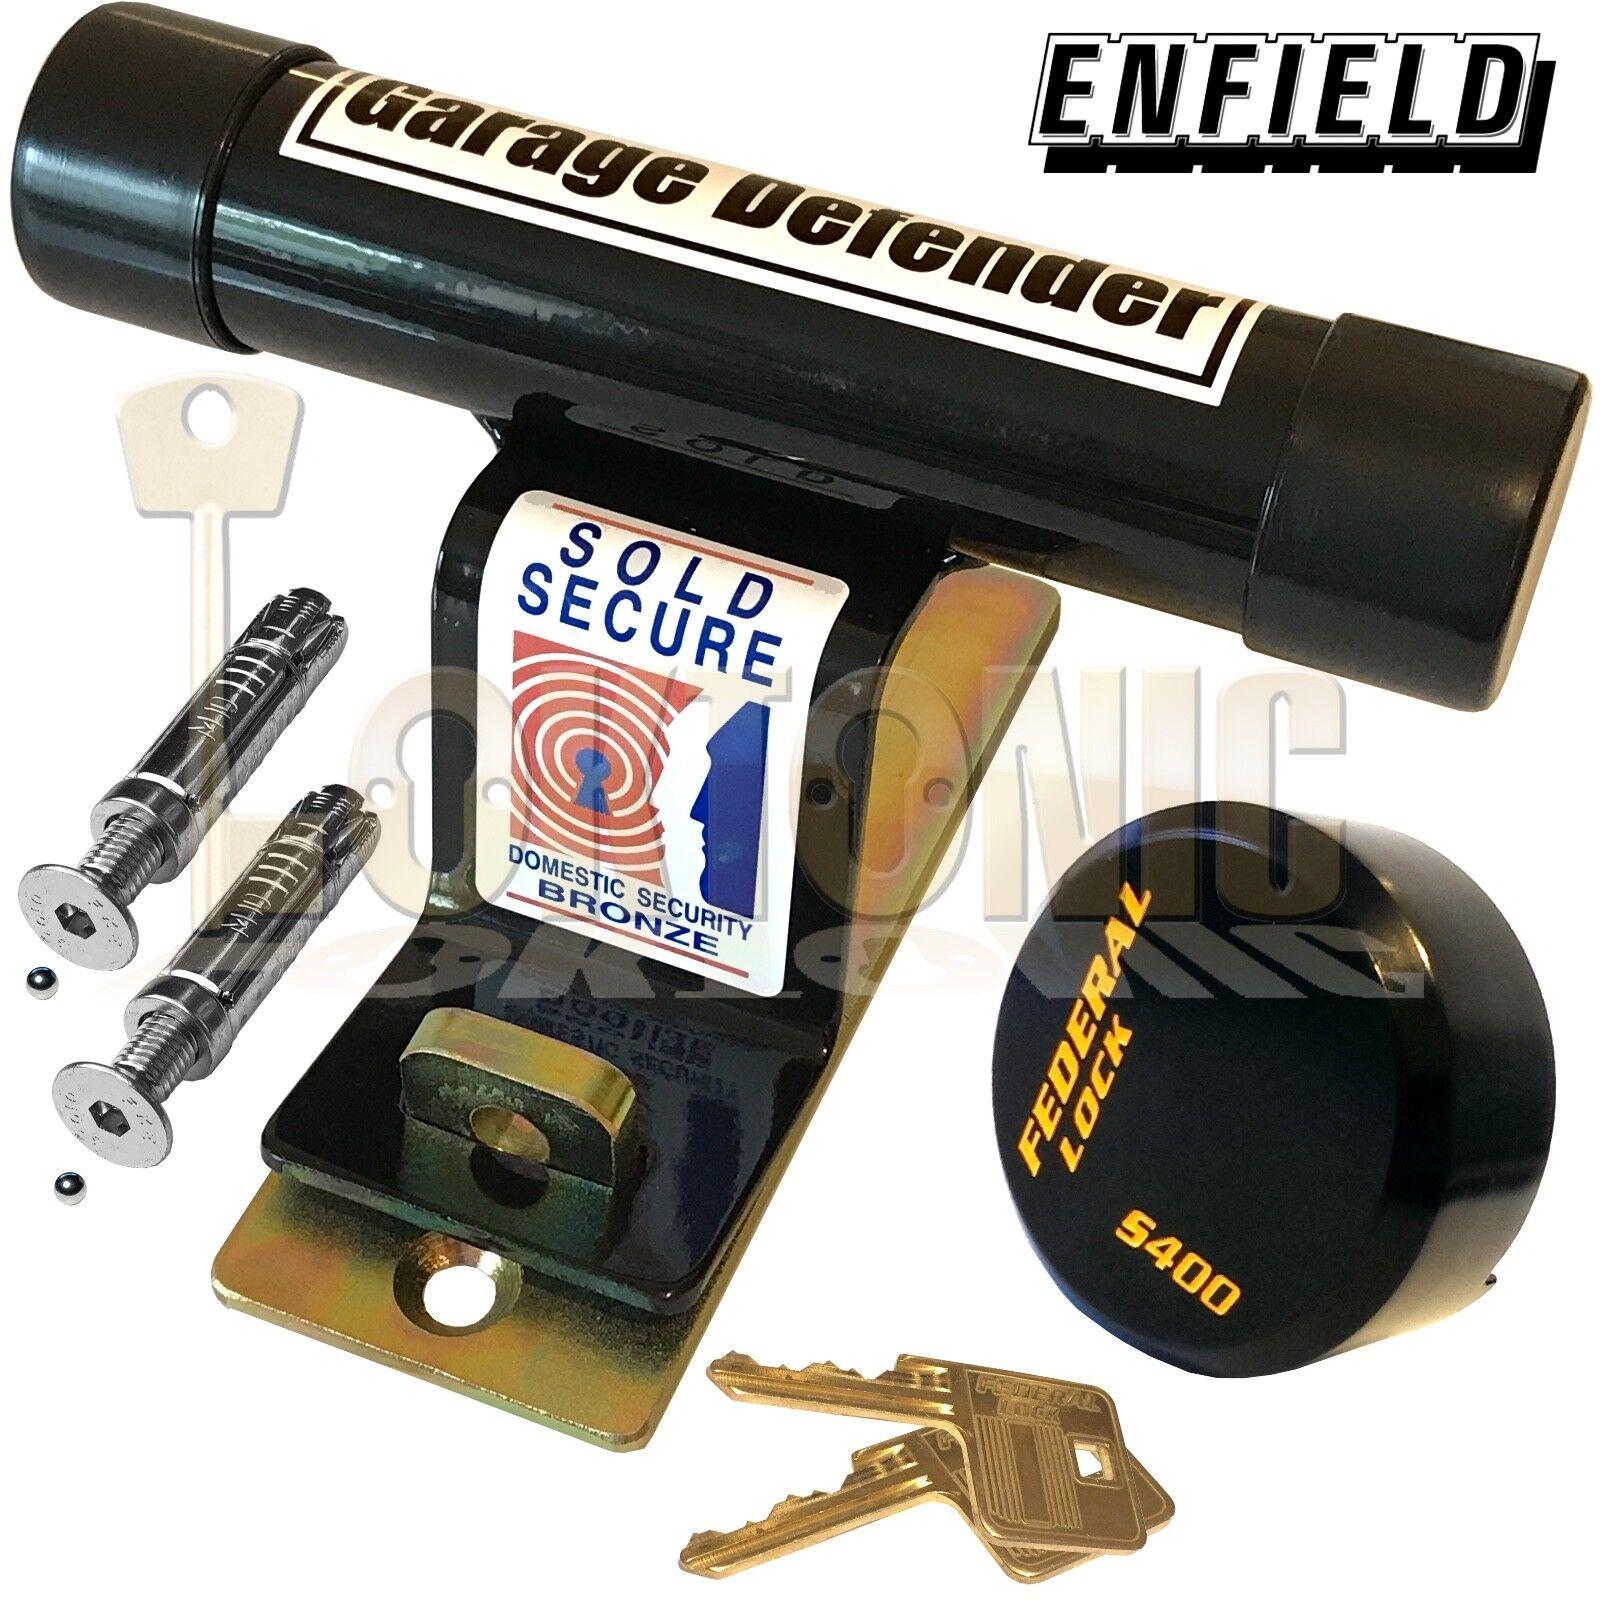 Enfield Up And Over Security Garage Door Defender Secure